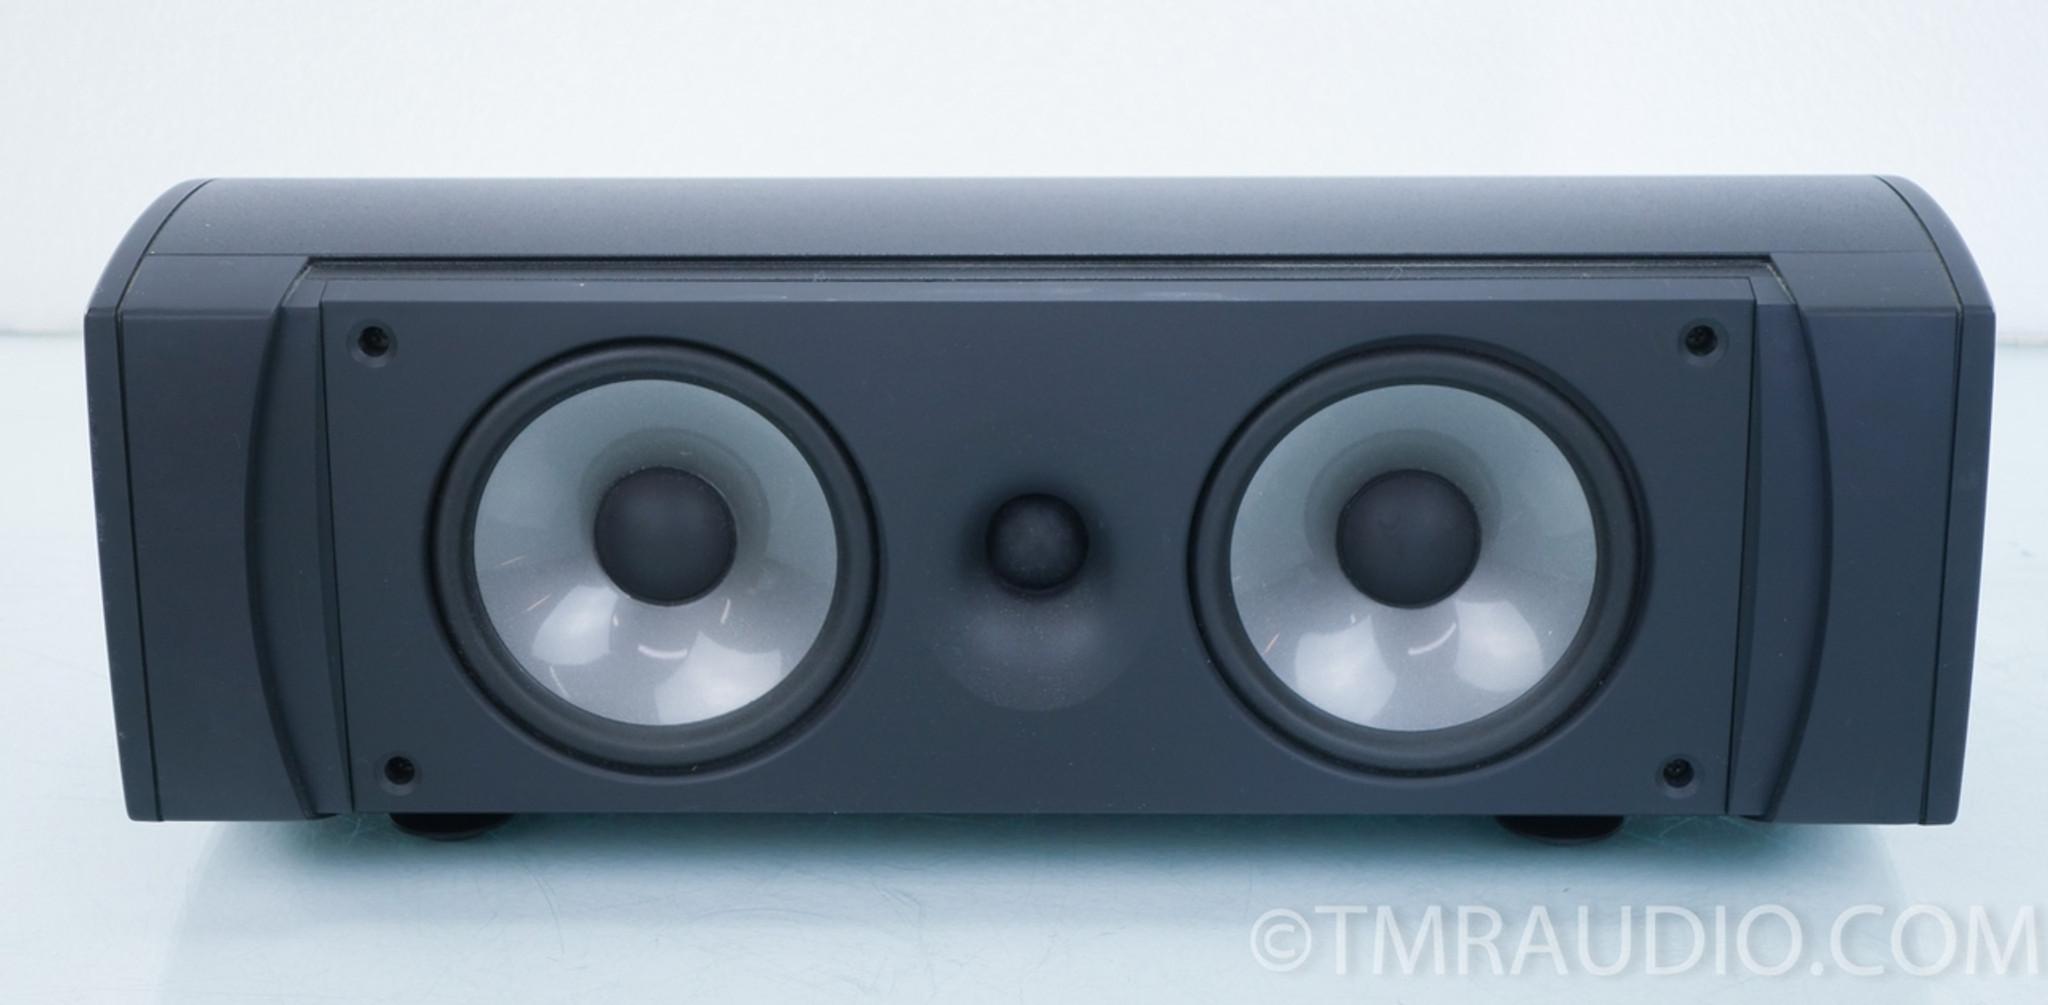 Infinity CC-10 Center Channel Speaker